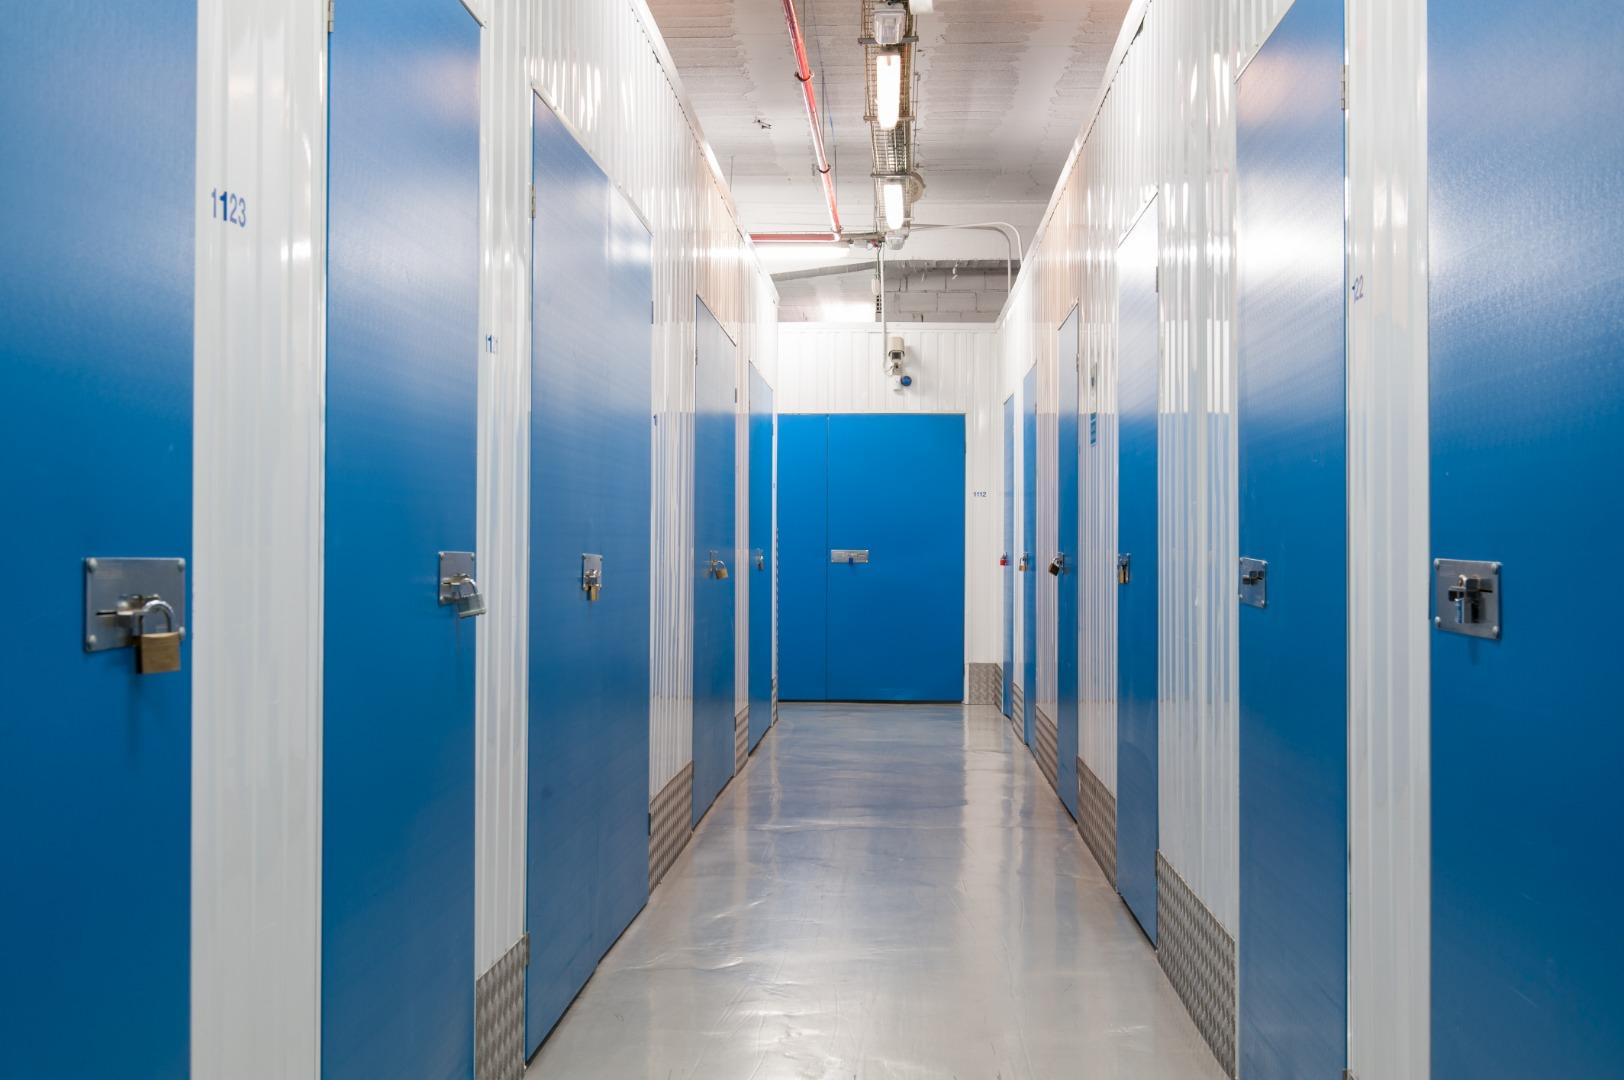 Lloguer Magatzem  Bajo vinalopó, 1. Trasteros bluespace de 30 m2 en mislata (valencia). tenemos dife